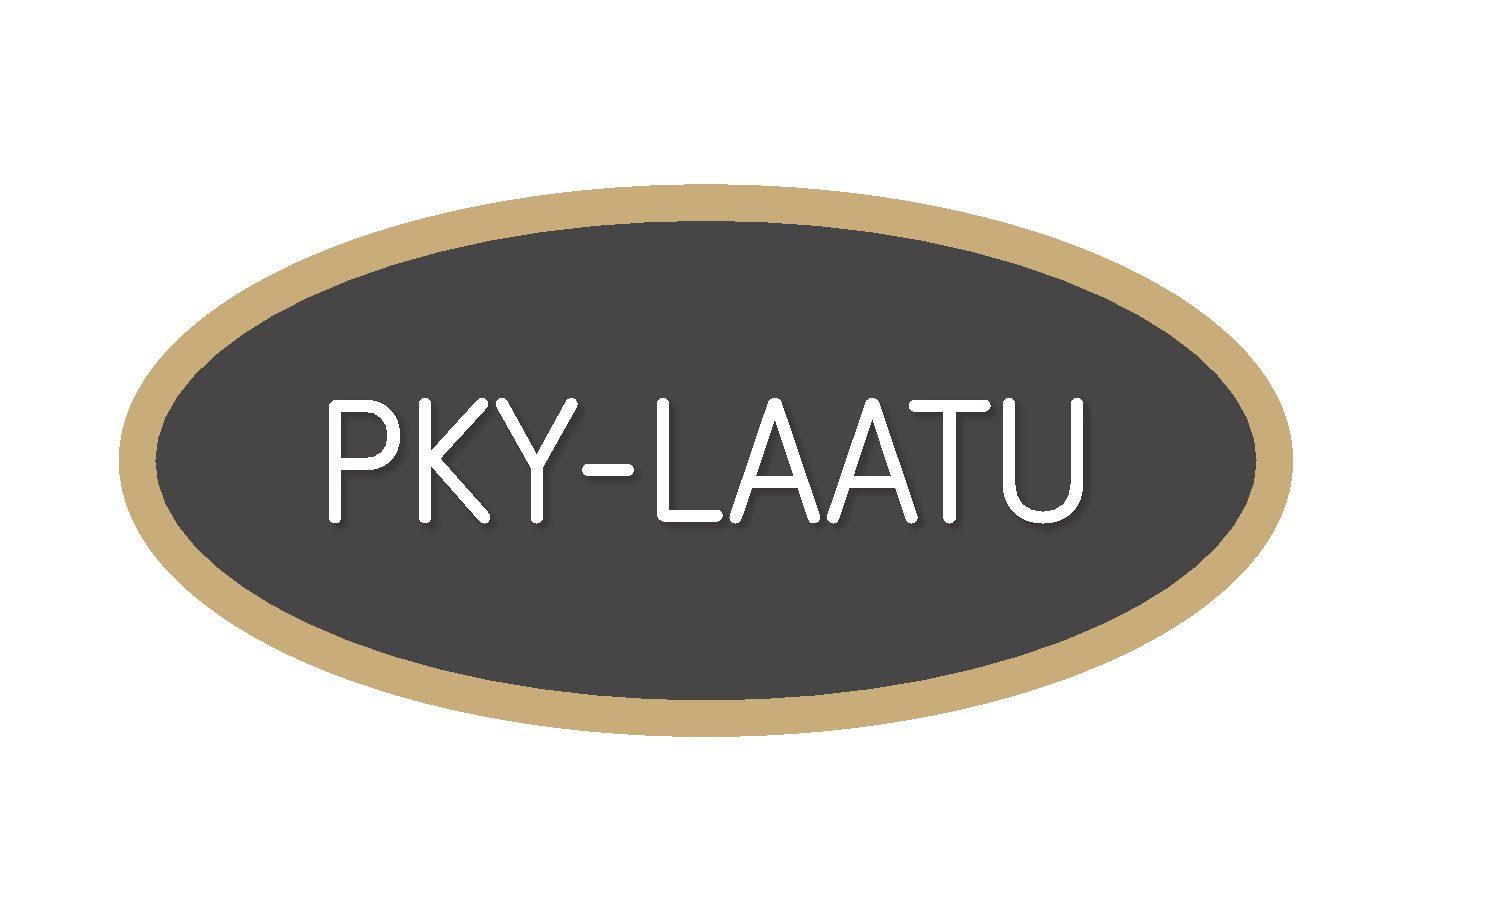 PKY-LAATU